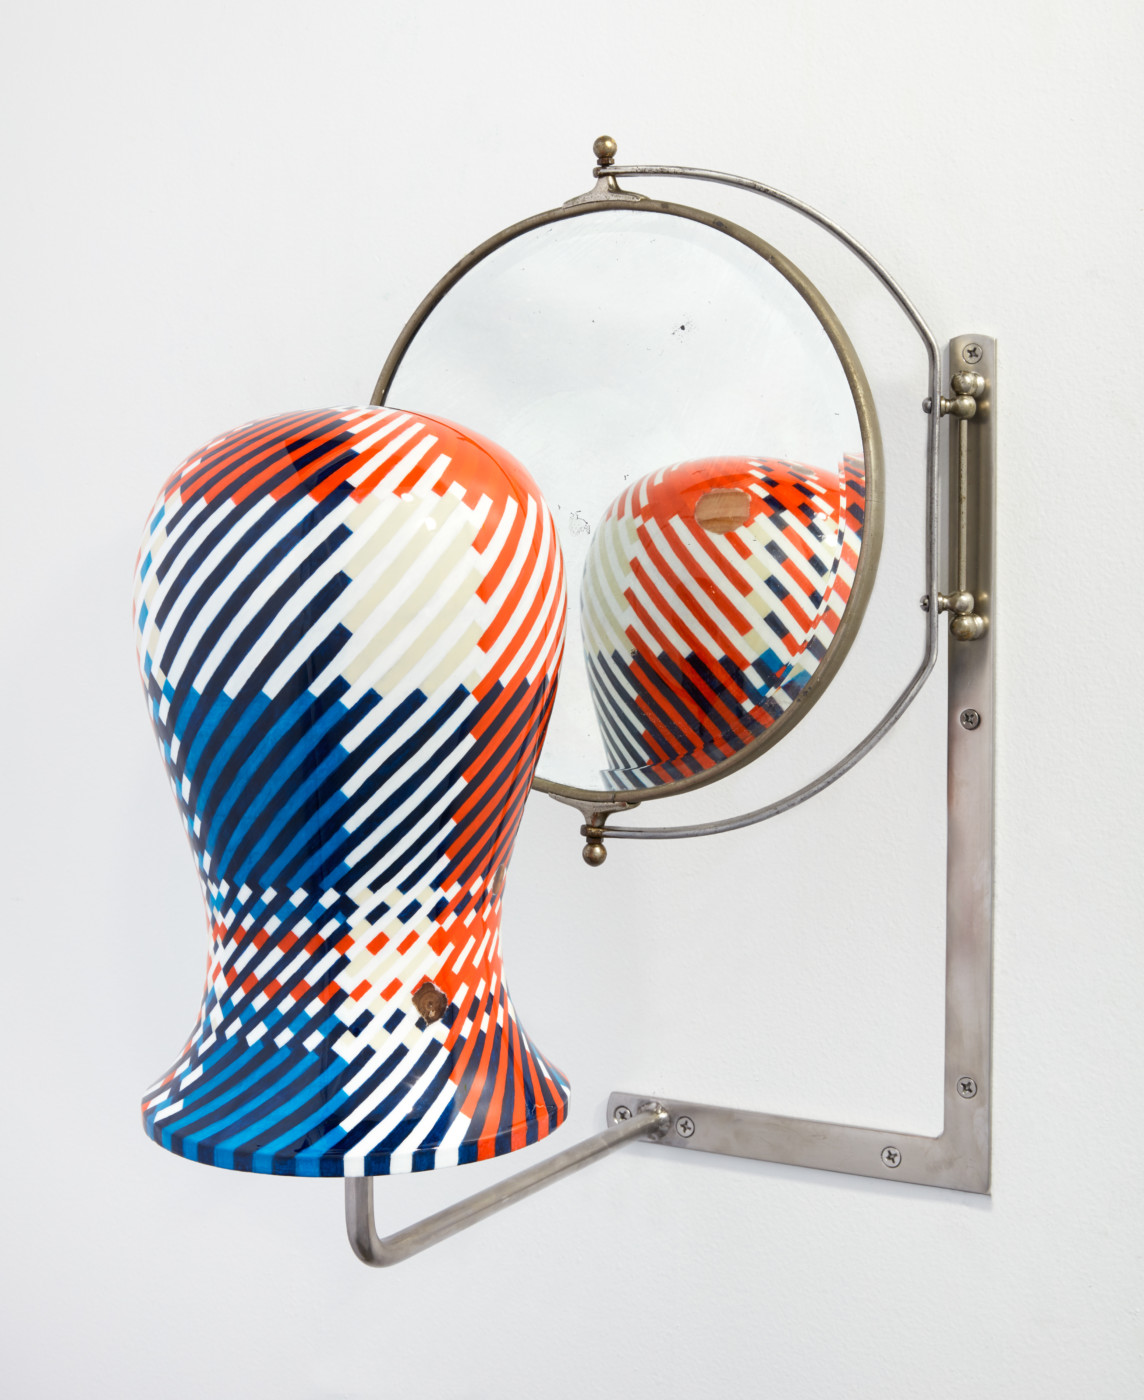 TÊTE  Tête fig. 5</I>, 2019 Acrylic, enamel, wood, steel, mirror 53 x 37 x 38.5 cm / 20 7/8 x 14 5/8 x 15 1/8 in  ORION MARTIN